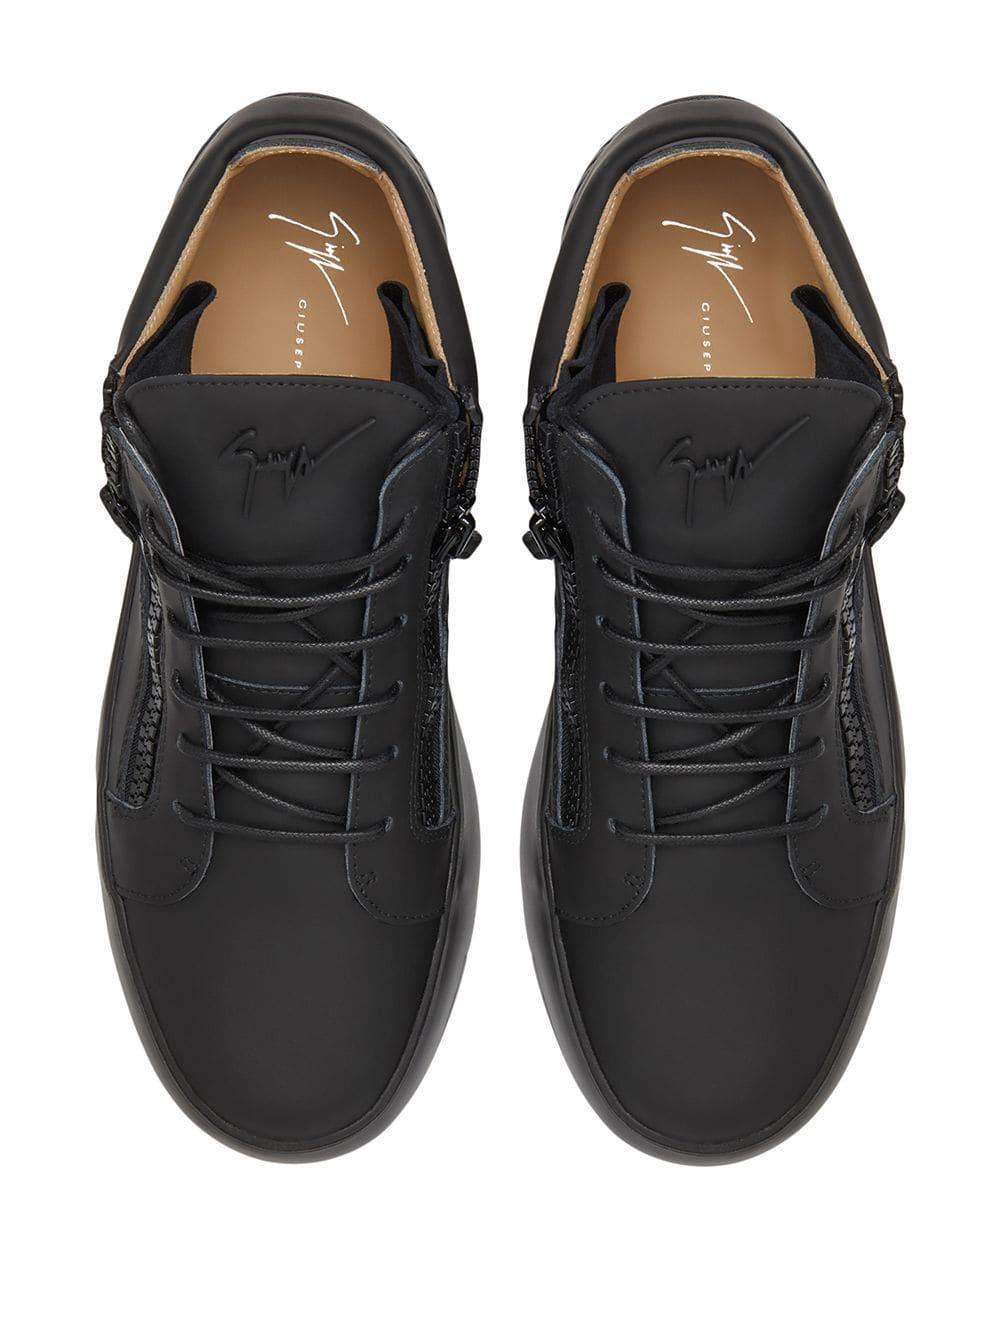 Zapatillas altas Addy Giuseppe Zanotti de Cuero de color Negro para hombre